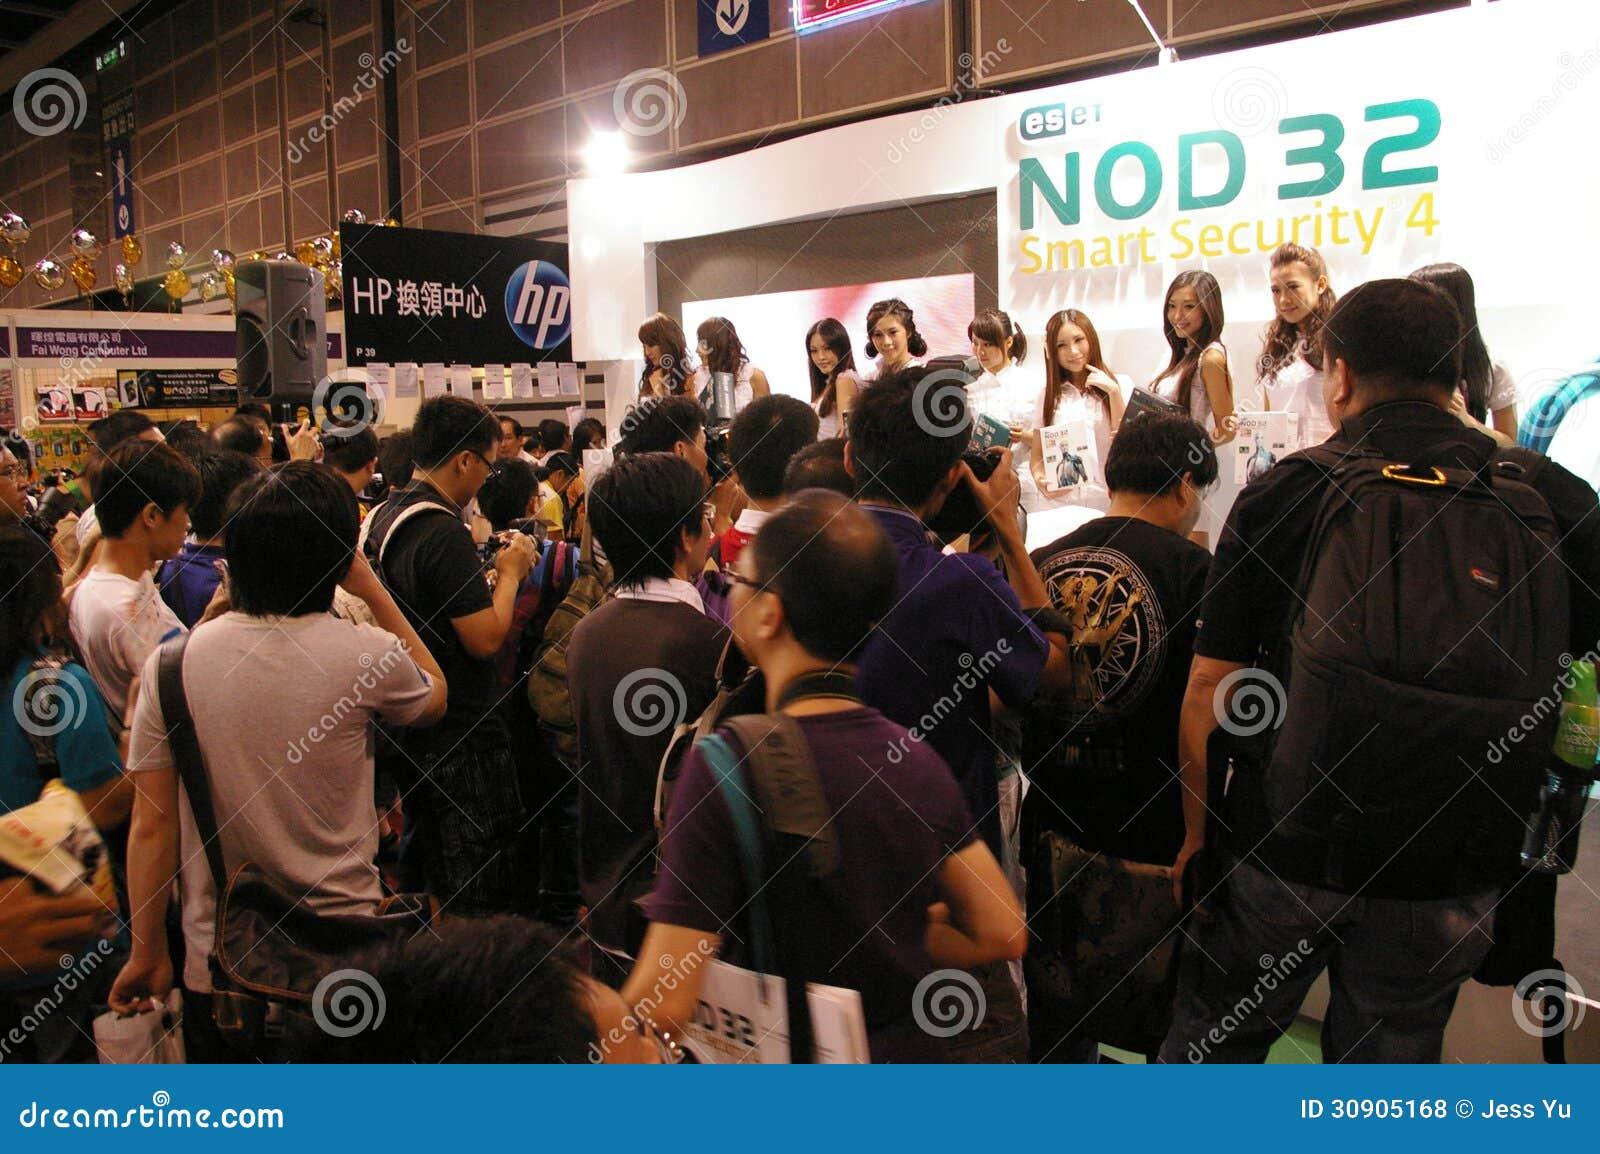 D Exhibition Hong Kong : Computer exhibition in hong kong editorial stock photo image of